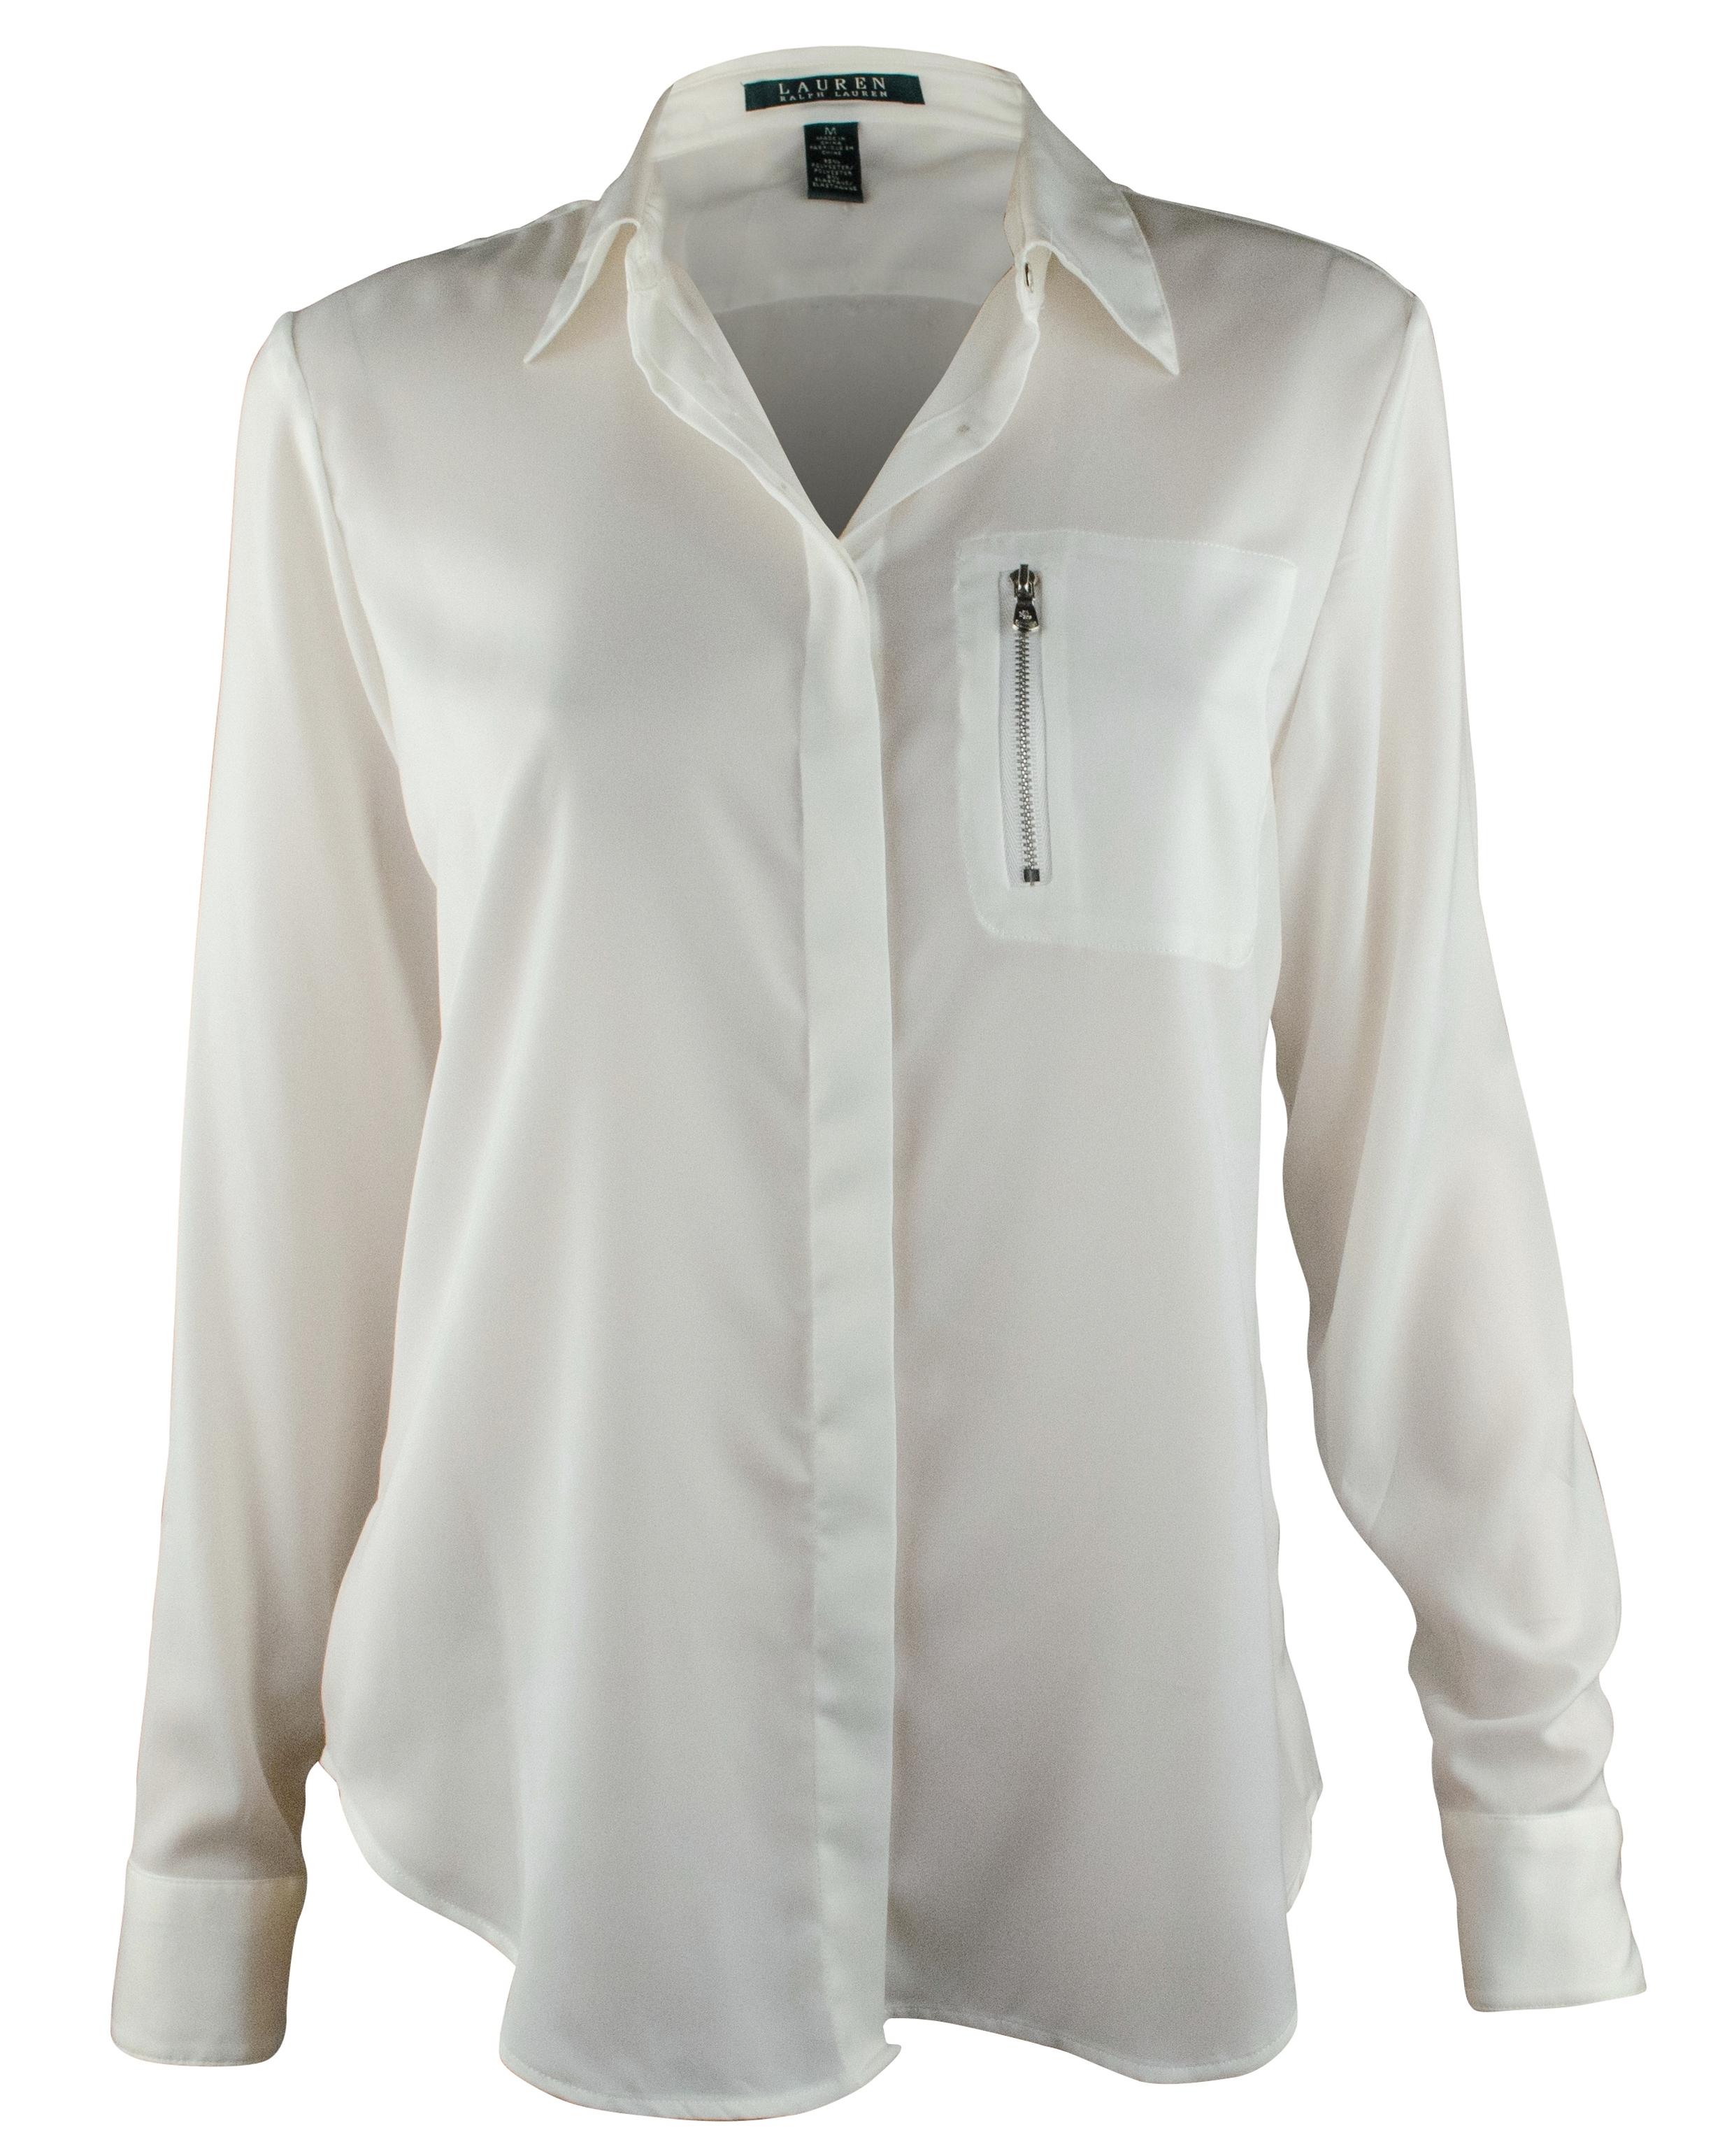 Ralph Lauren Women 39 S Zip Pocket Satin Blouse Shirt Tops Ebay